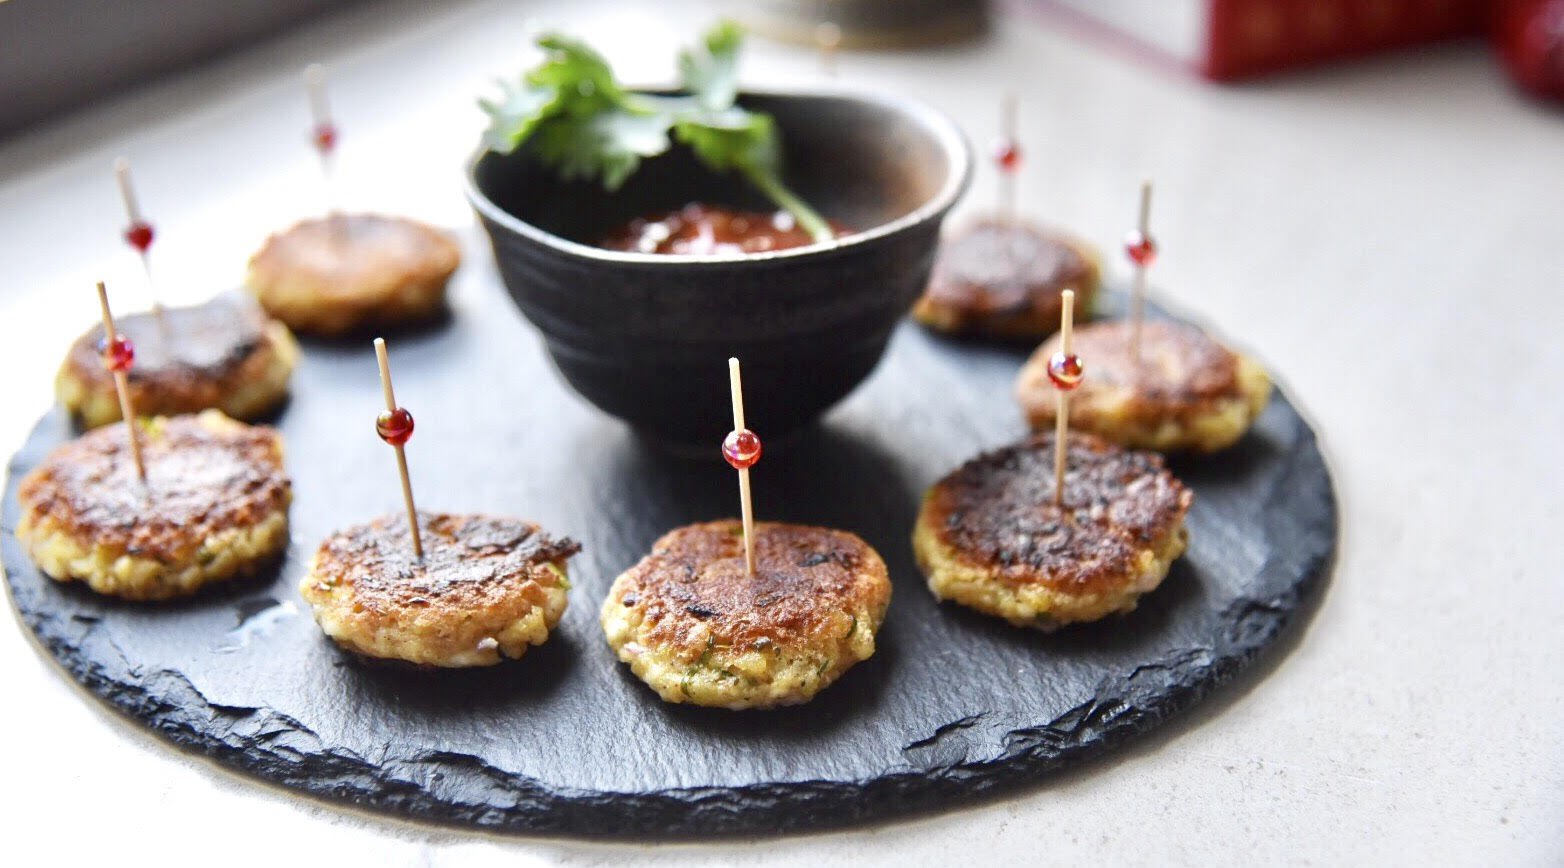 Vegetarian malai kebab recipe by archanas kitchen vegetarian malai kebab recipe forumfinder Images